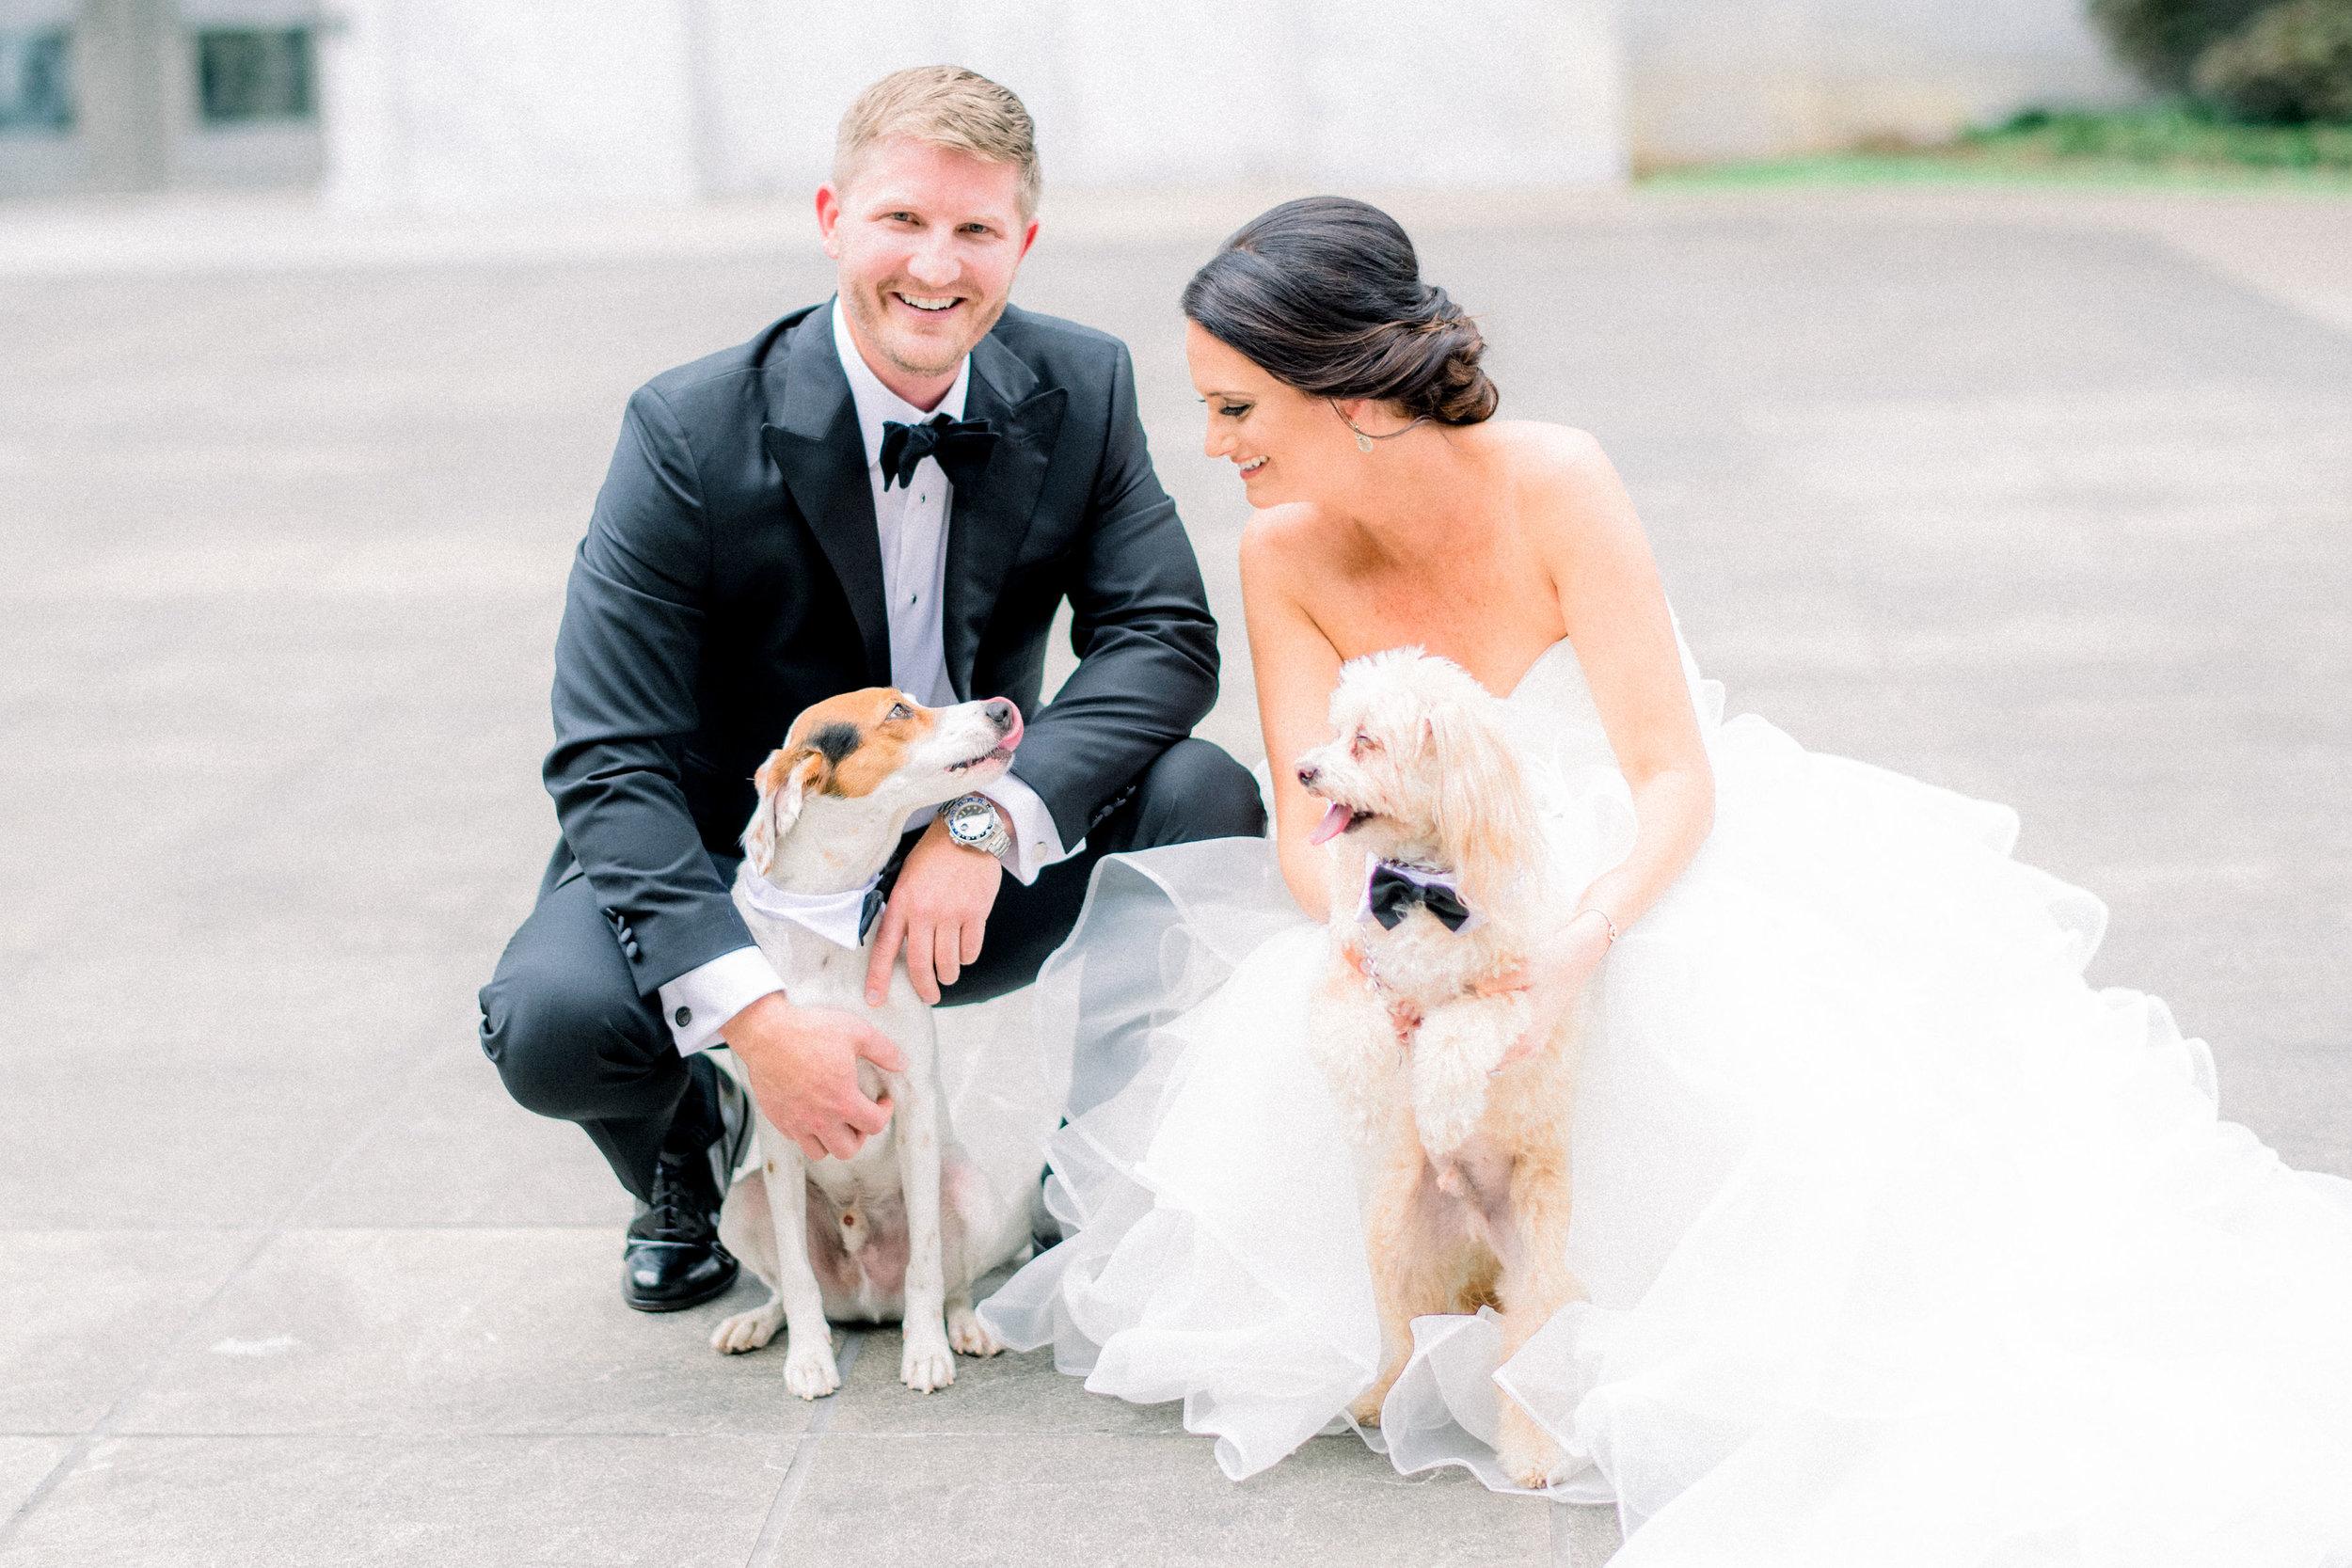 johnson_wedding-236.jpg